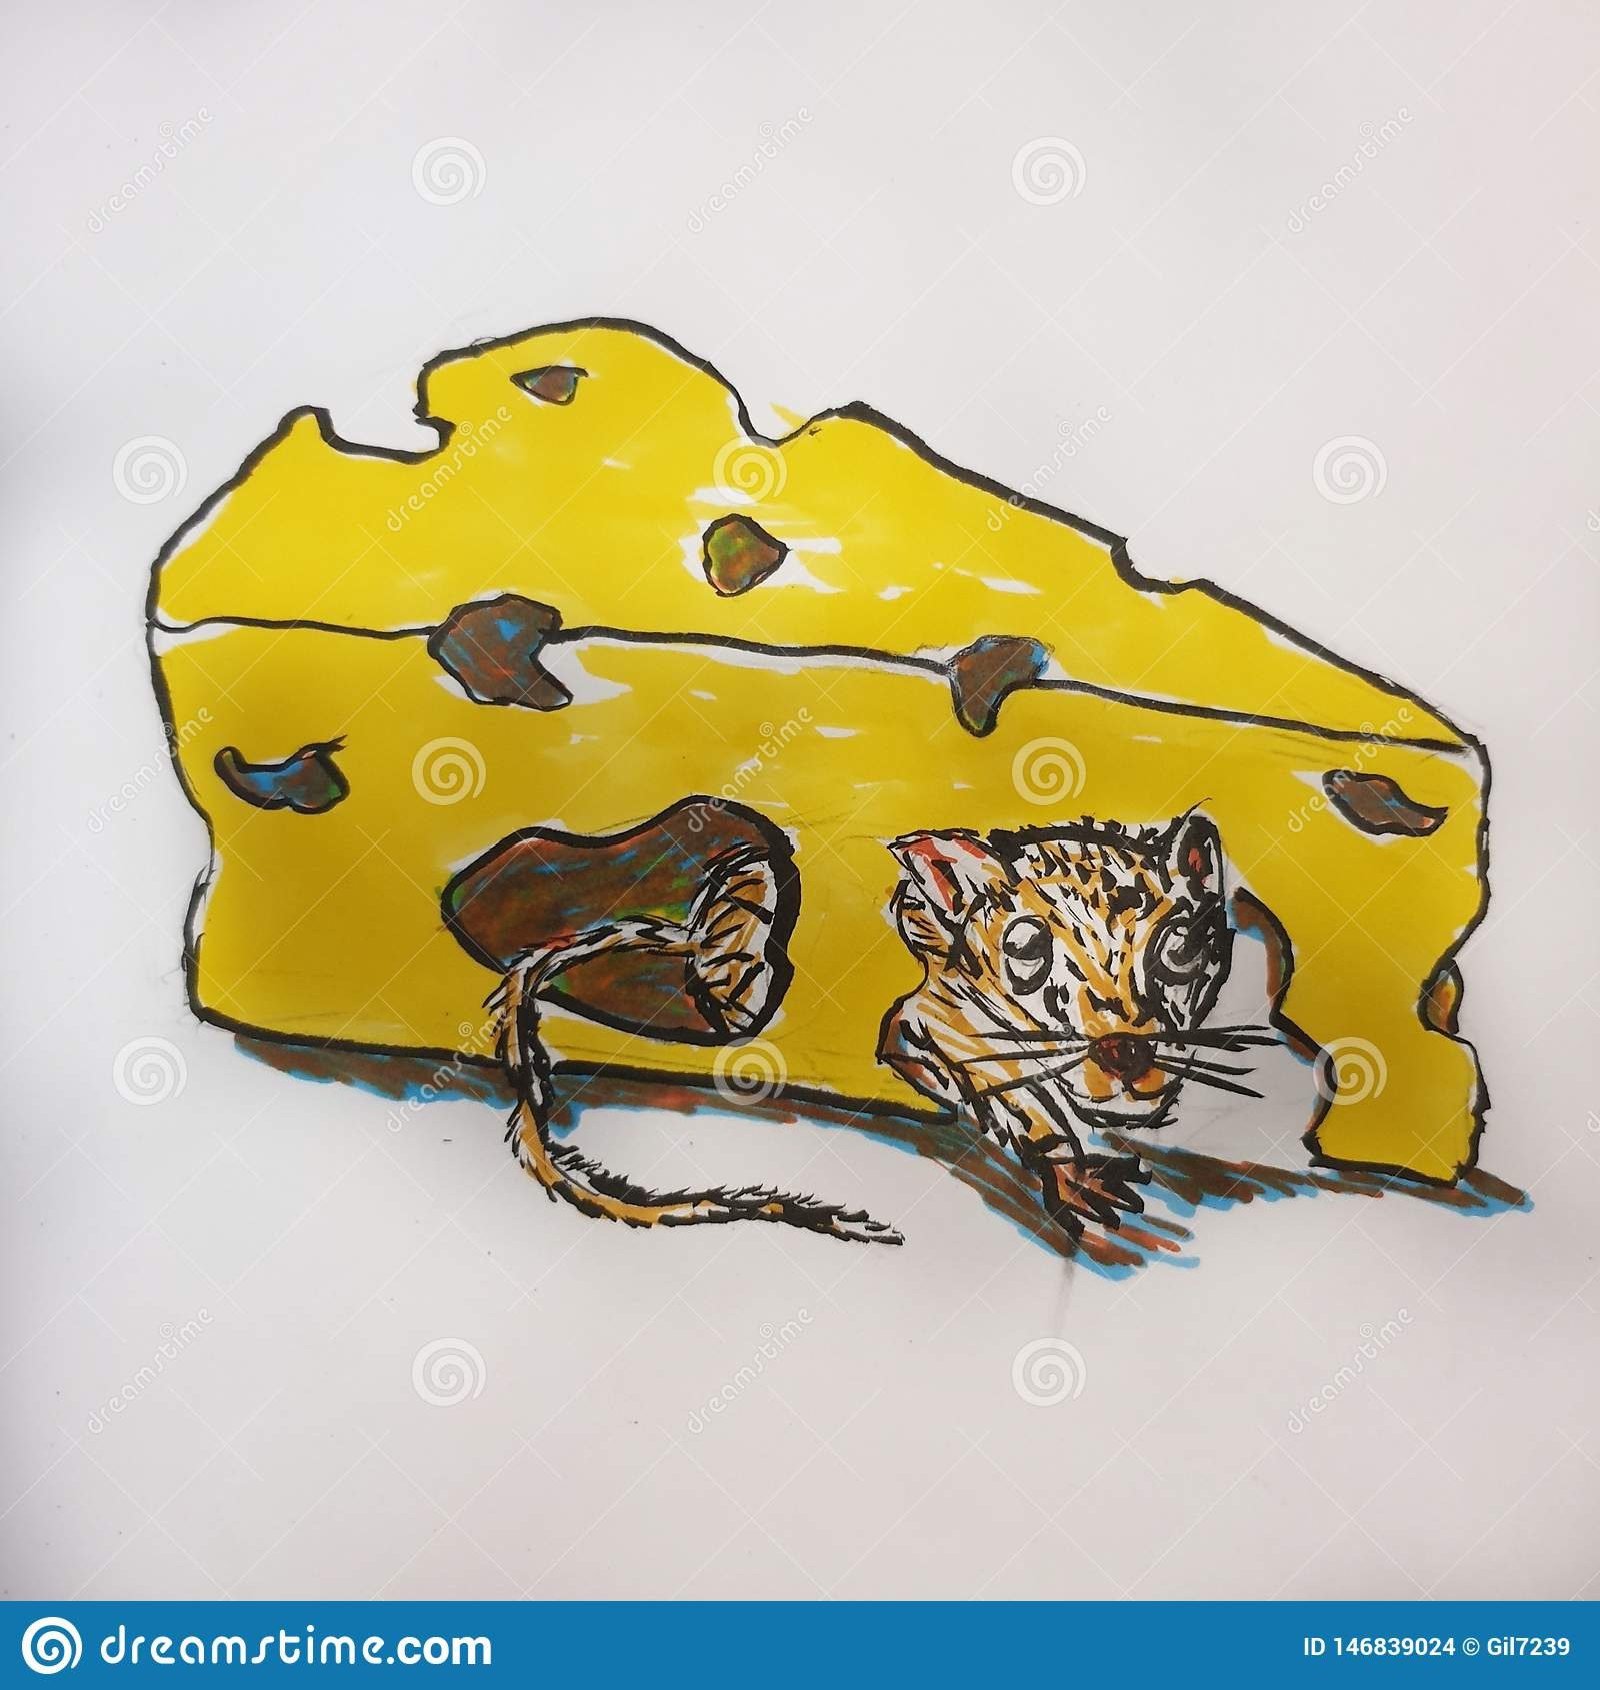 Ratón en un queso amarillo